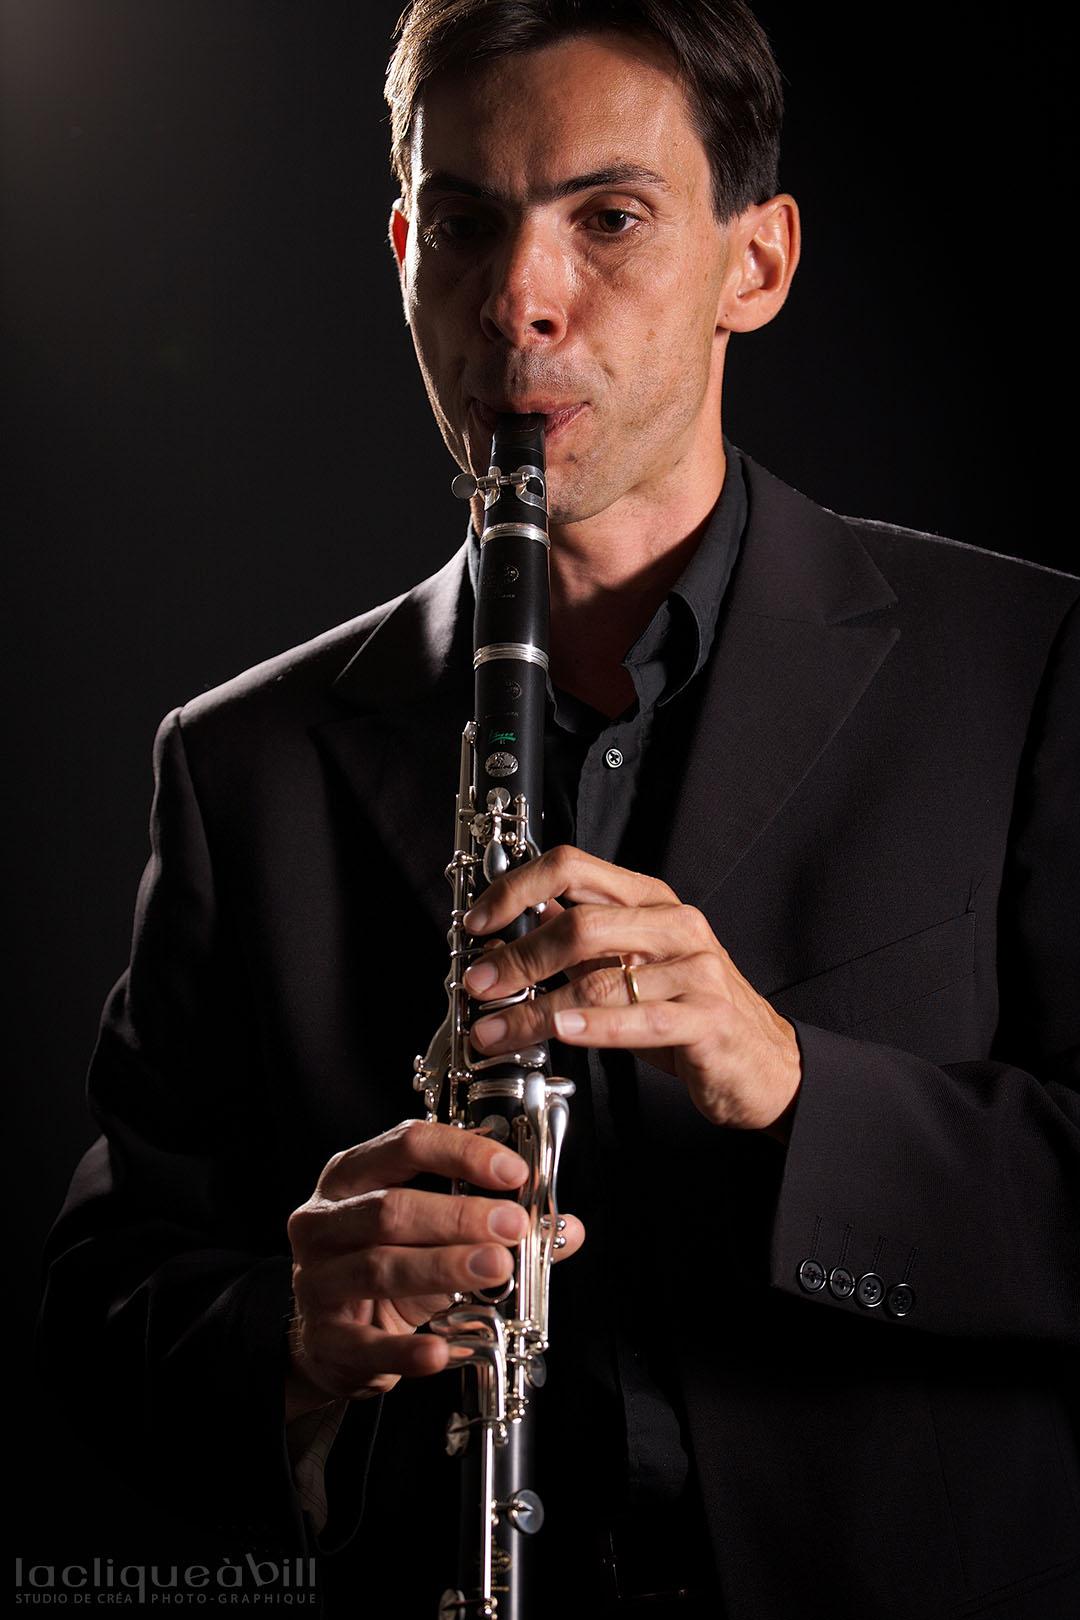 Daniel Chabert à la clarinette